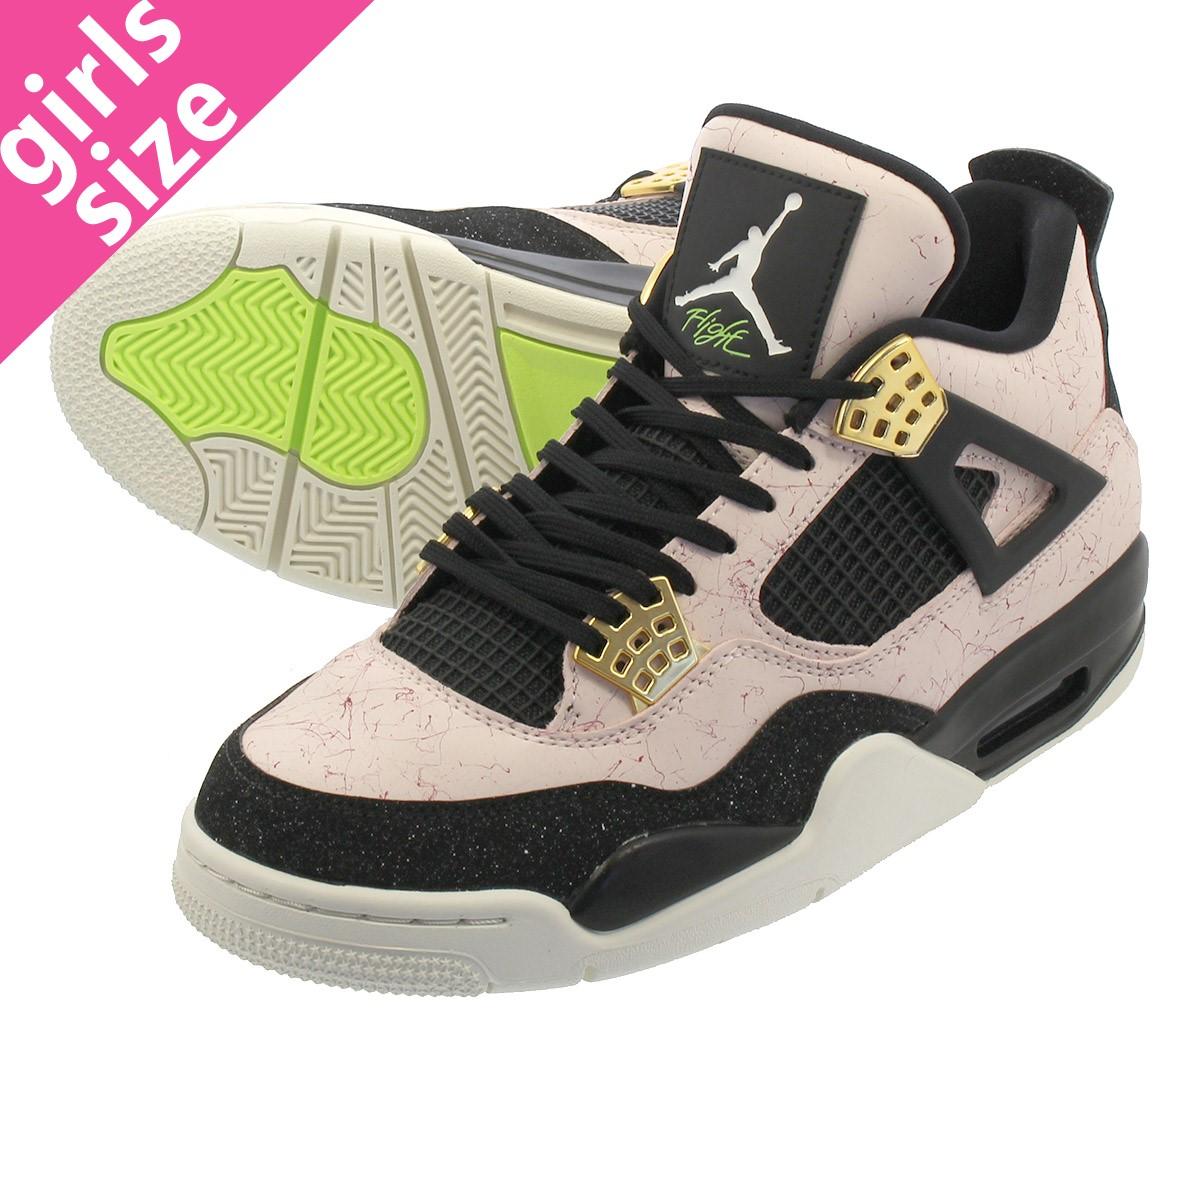 1fa9d0ee8ea NIKE WMNS AIR JORDAN 4 RETRO Nike women Air Jordan 4 nostalgic SILT  RED BLACK ...